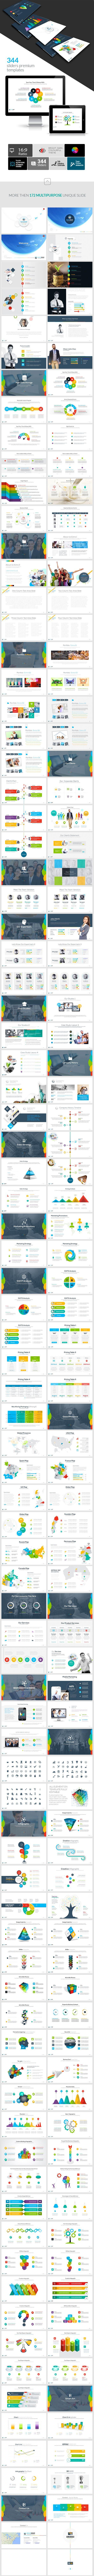 BuildGear Multipurpose Keynote/PowerPoint Presentation, from GraphicRiver.